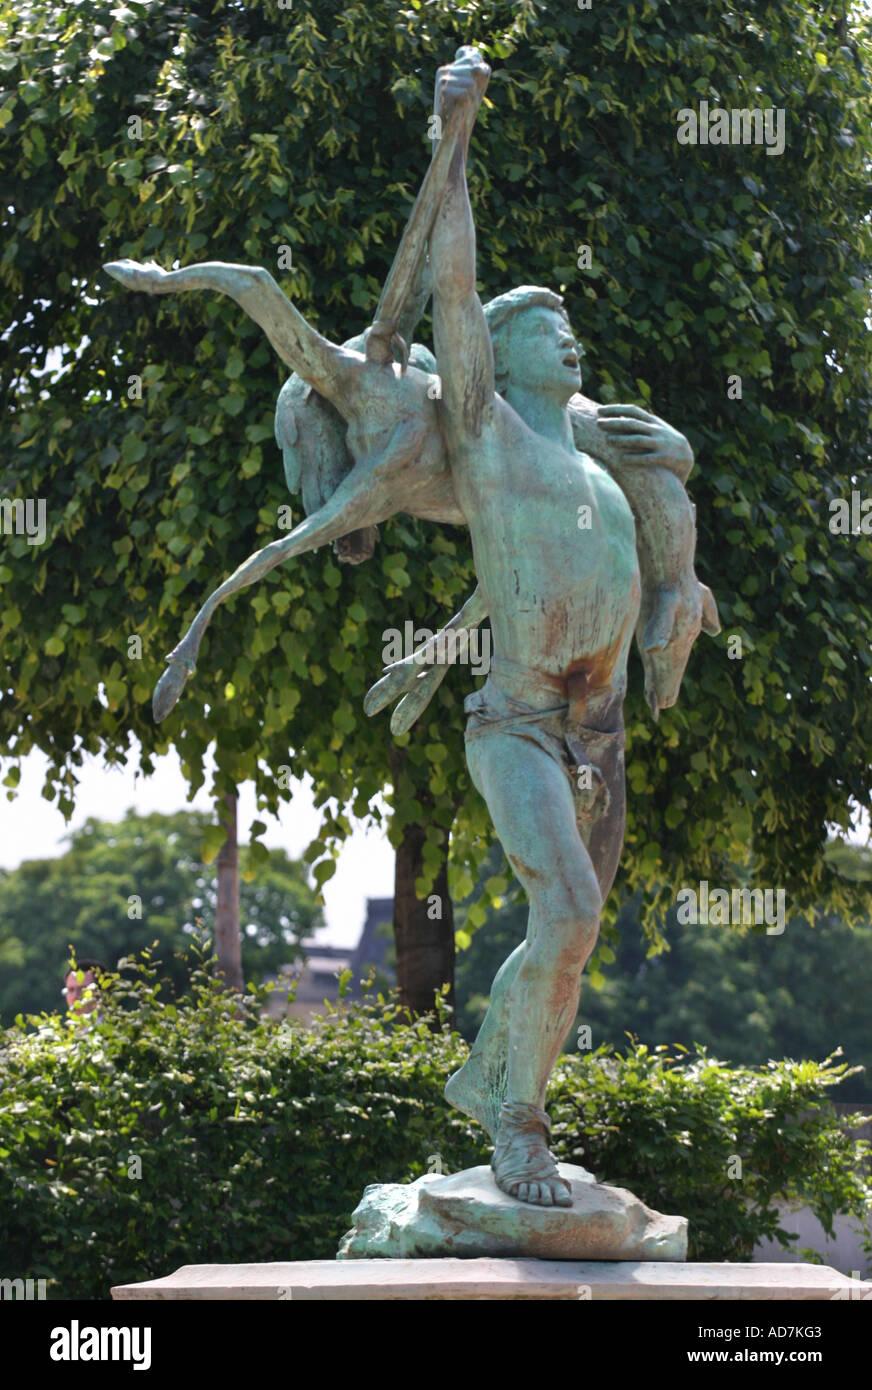 Retour de chasse statue 1888 by antonin carl s at the jardin des stock photo royalty free - Statues jardin des tuileries ...